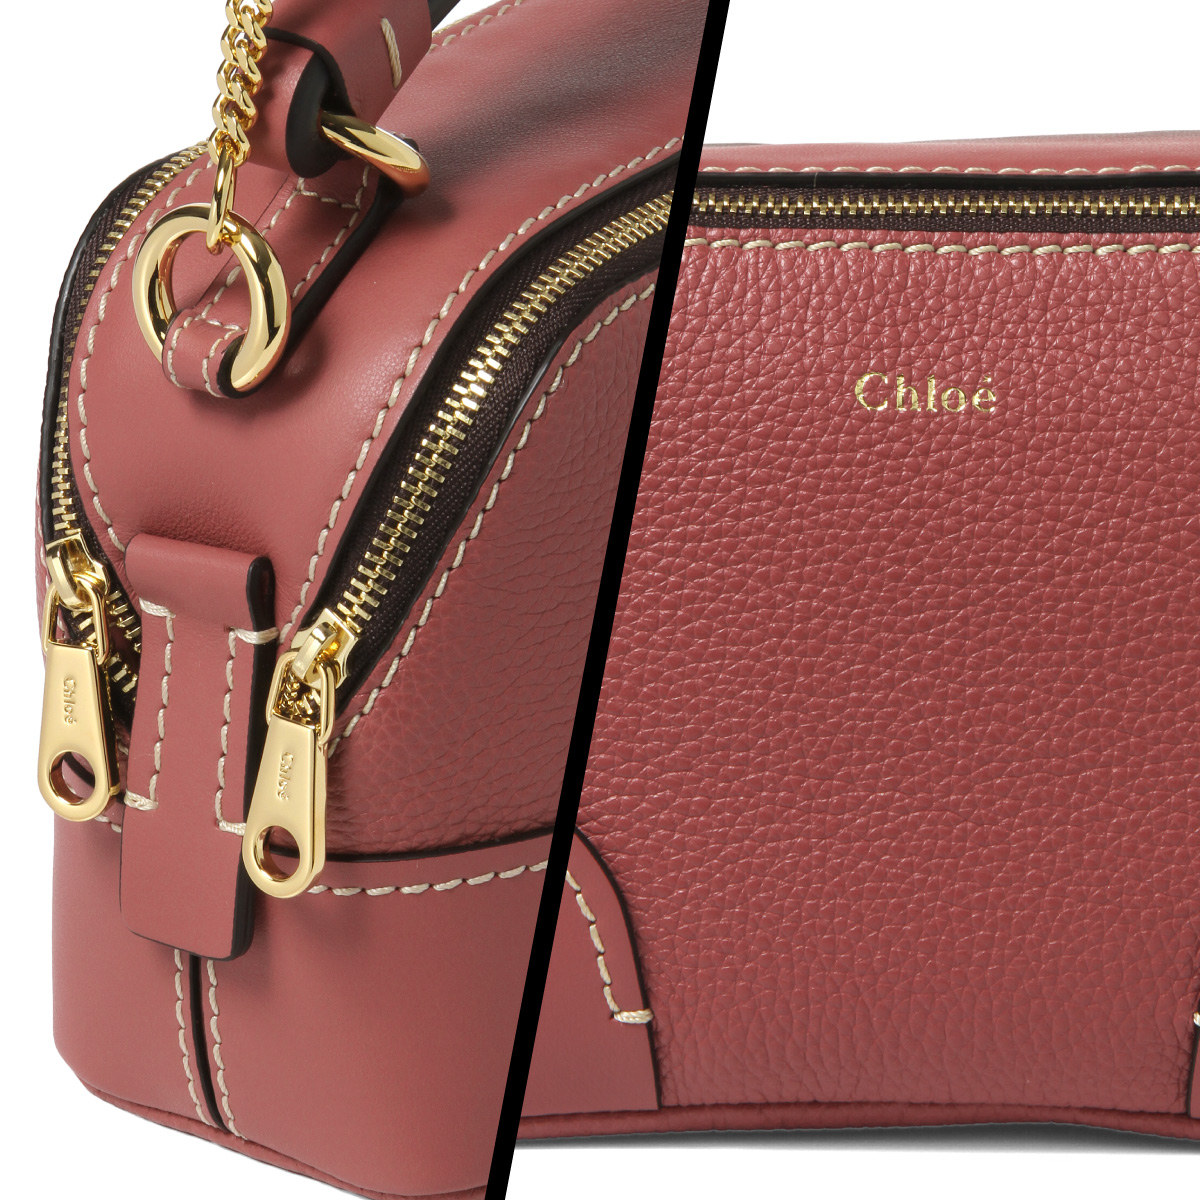 CHLOE クロエ | ショルダー付 ハンドバッグ ミニ | DARIA ダリア